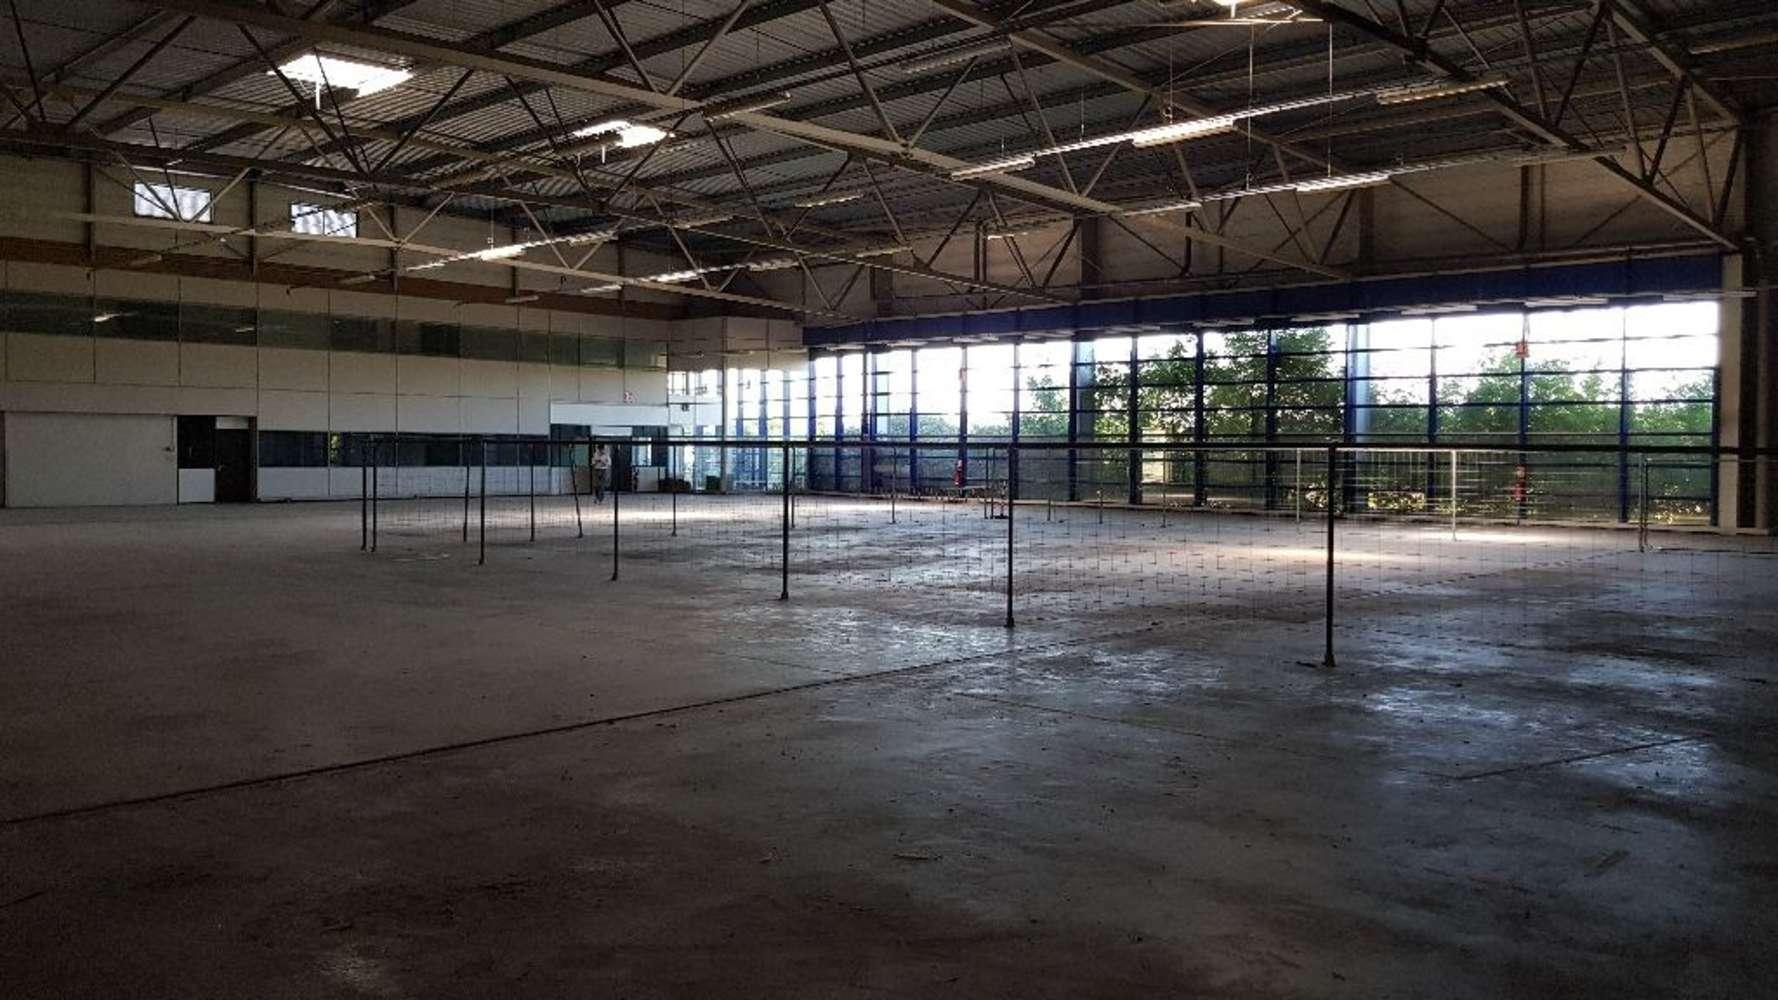 Activités/entrepôt Vaulx milieu, 38090 - Entrepot à vendre Lyon - Vaulx Milieu - 10471422